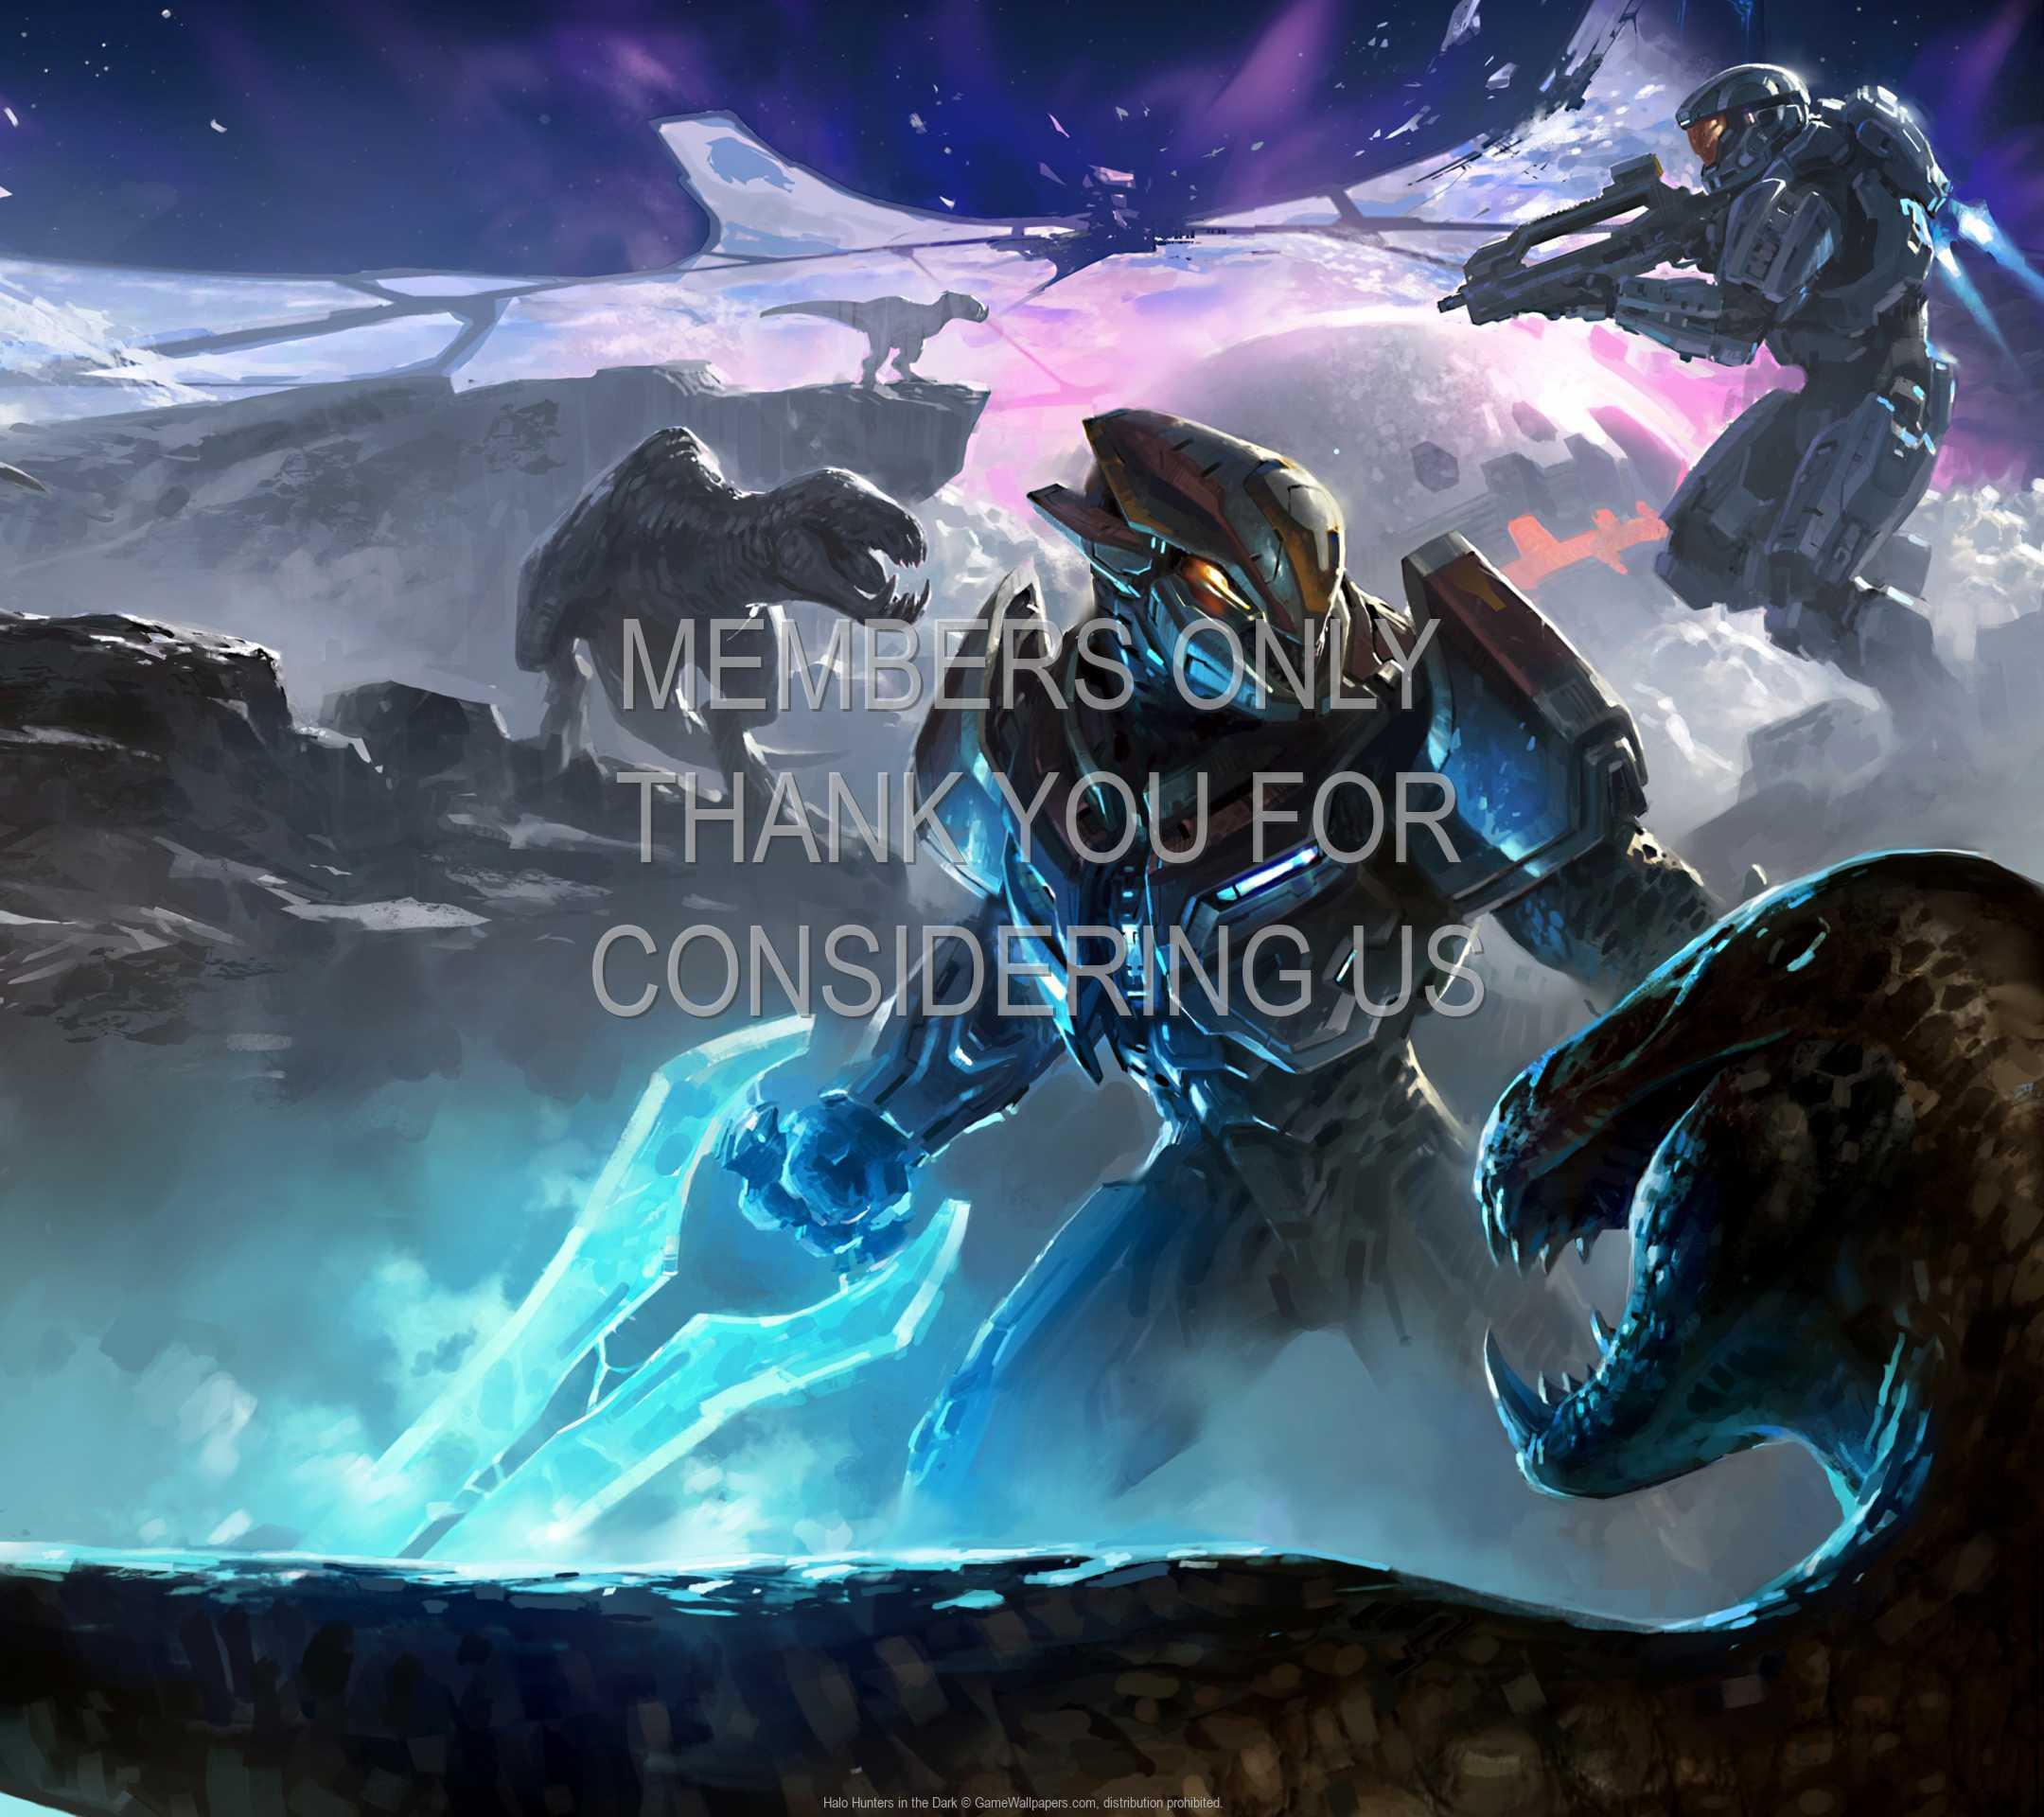 Halo: Hunters in the Dark 1080p Horizontal Handy Hintergrundbild 01